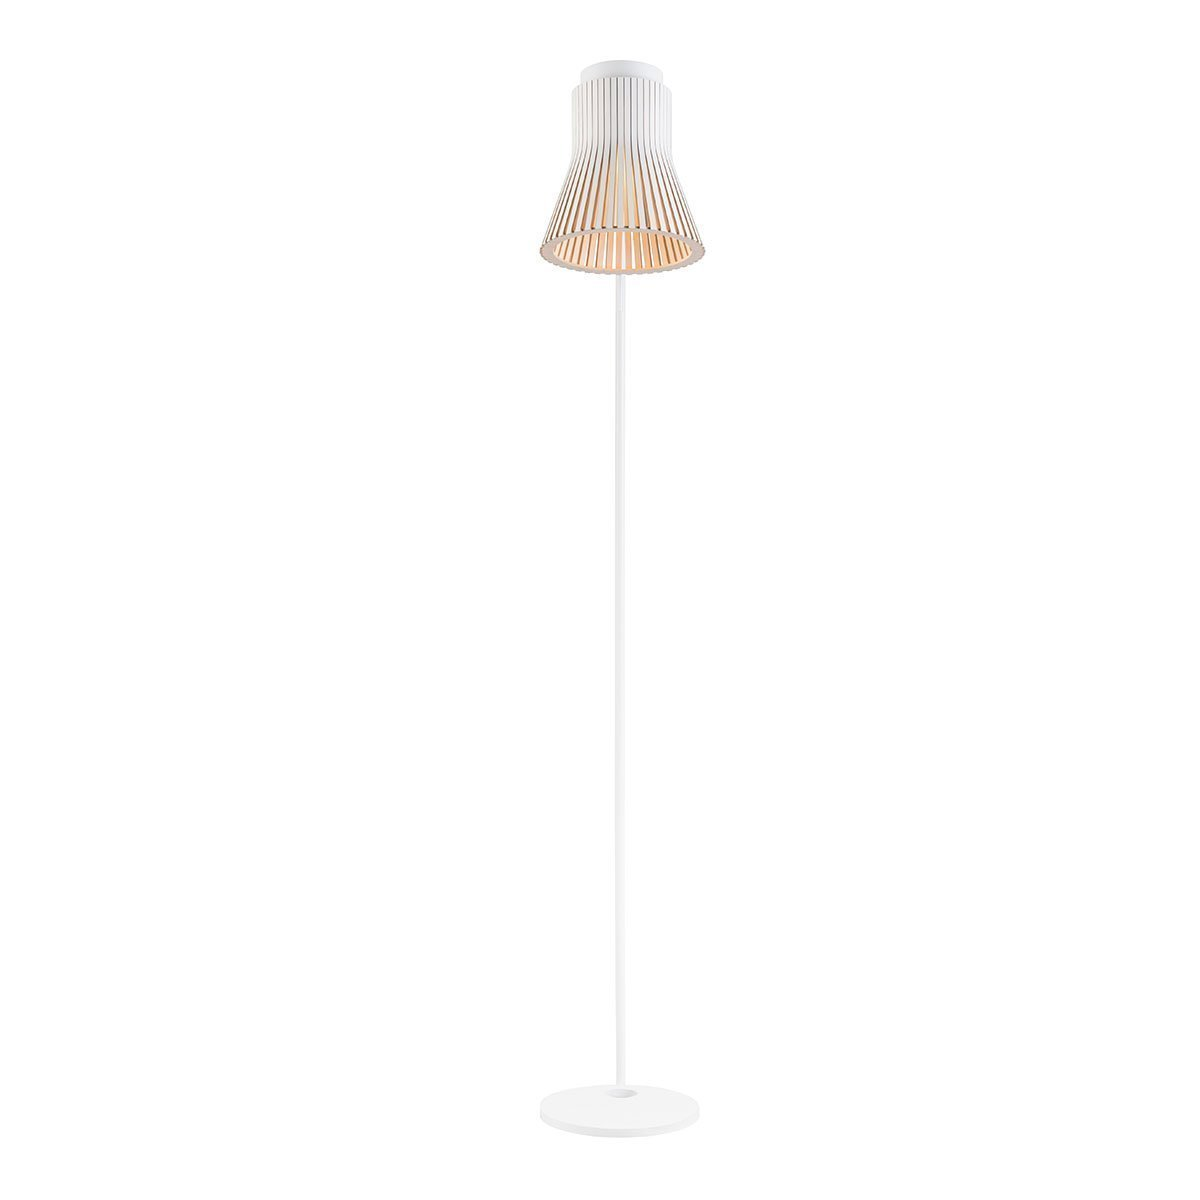 Secto Design Petite 4610 Vloerlamp - Wit